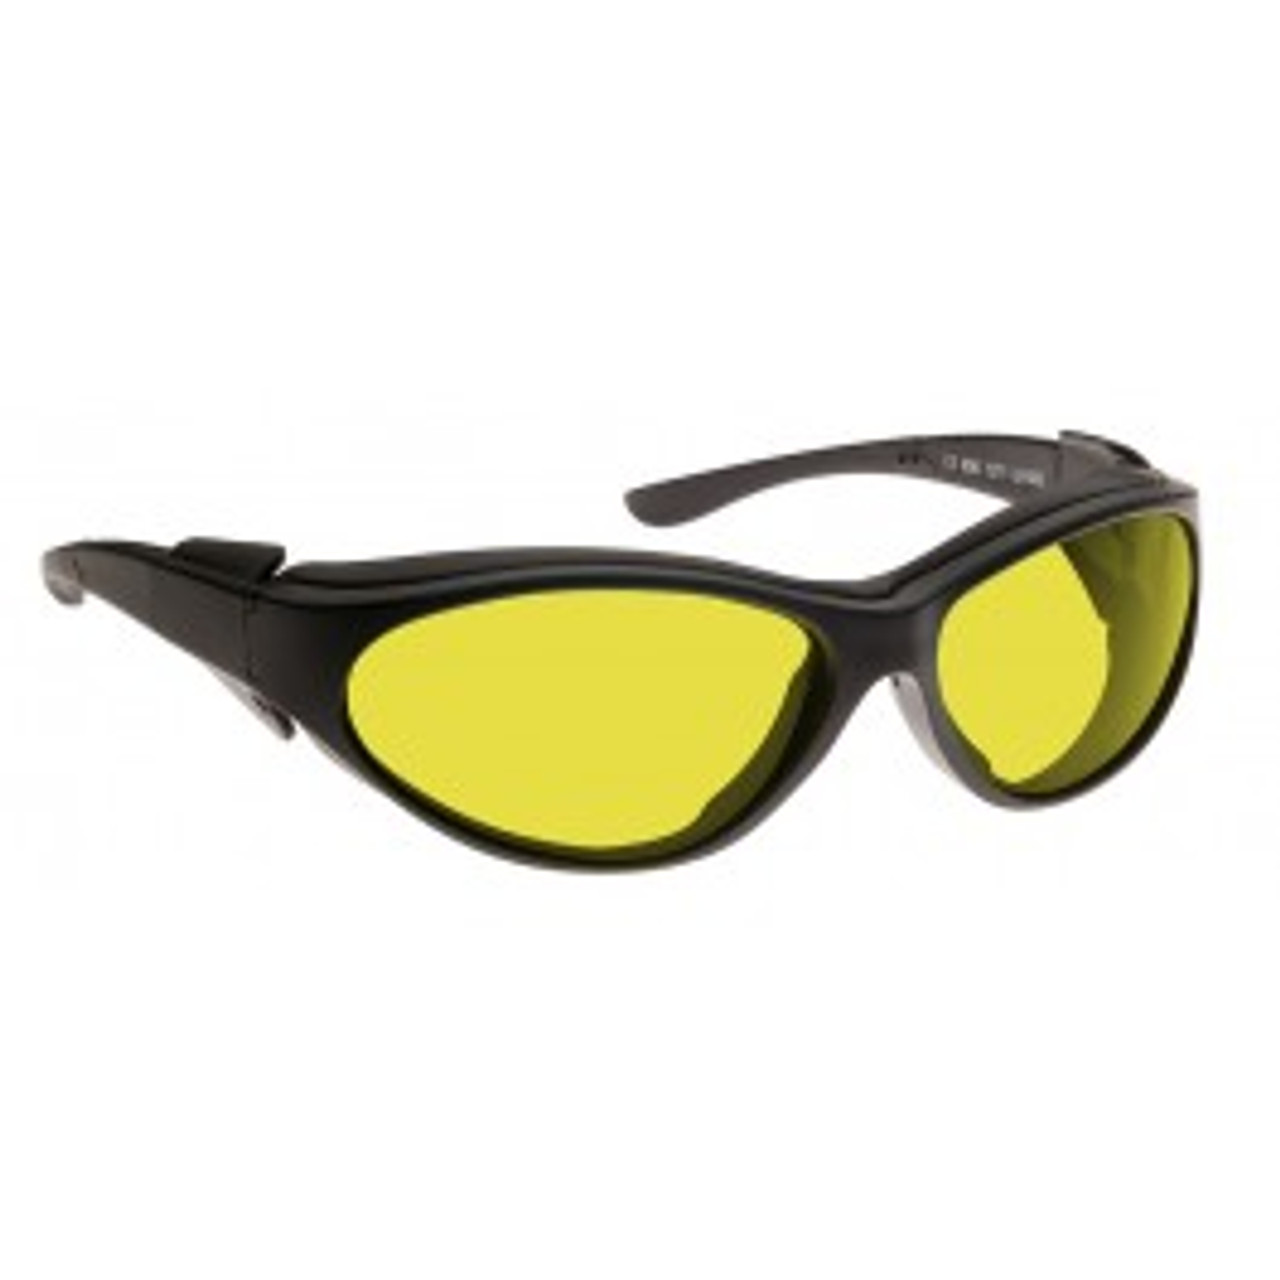 NOIR UVShield 87% Yellow